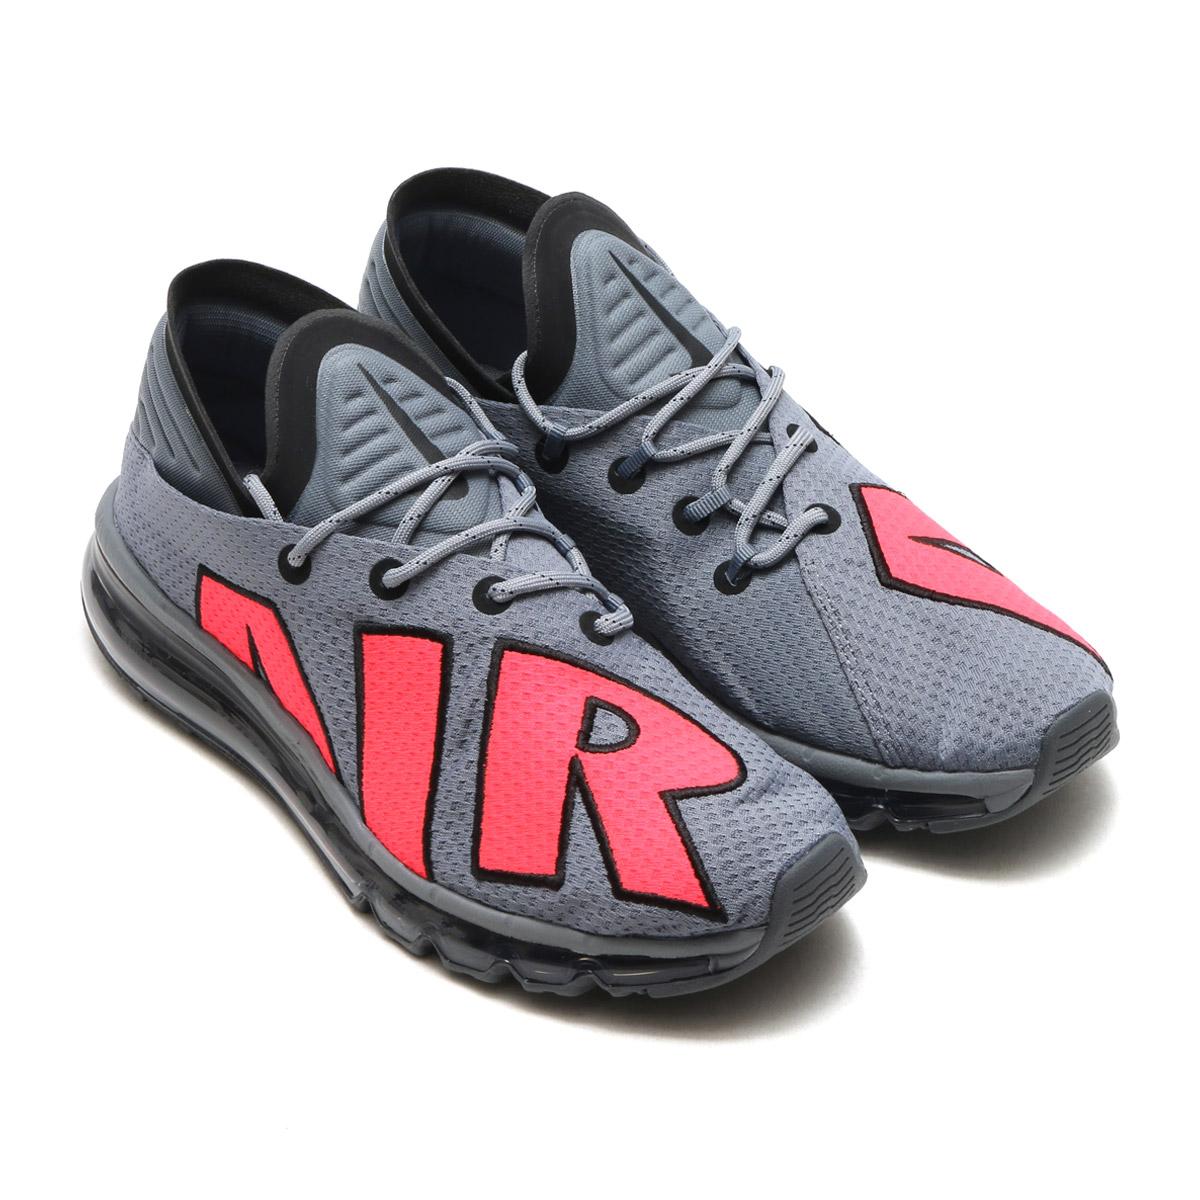 NIKE AIR MAX FLAIR(ナイキ エア マックス フレア)(COOL GREY/SOLAR RED-BLACK-PURE PLATINUM)【メンズ レディース スニーカー】17FA-S